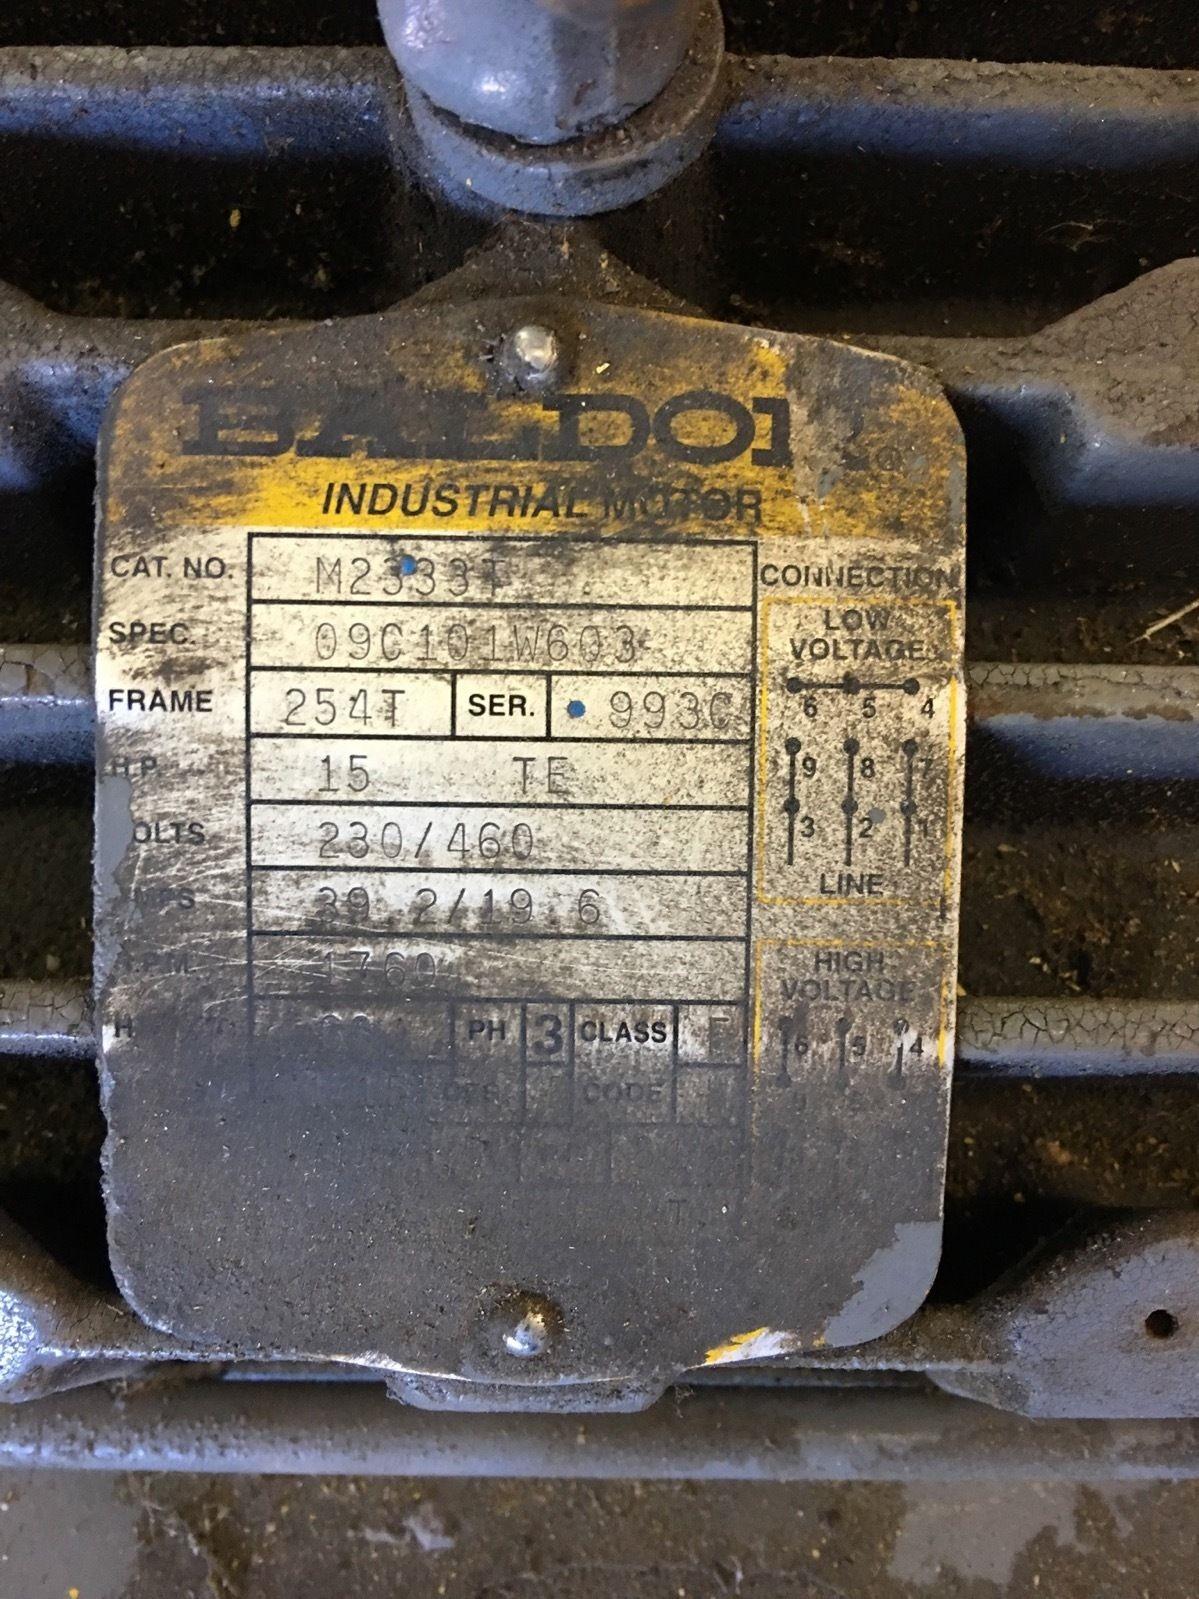 NEWÂ BALDOR M2331 3 PHASE INDUSTRIAL MOTOR 15 HP, 254T FRAME, 1760 RPM, (NP1) 2